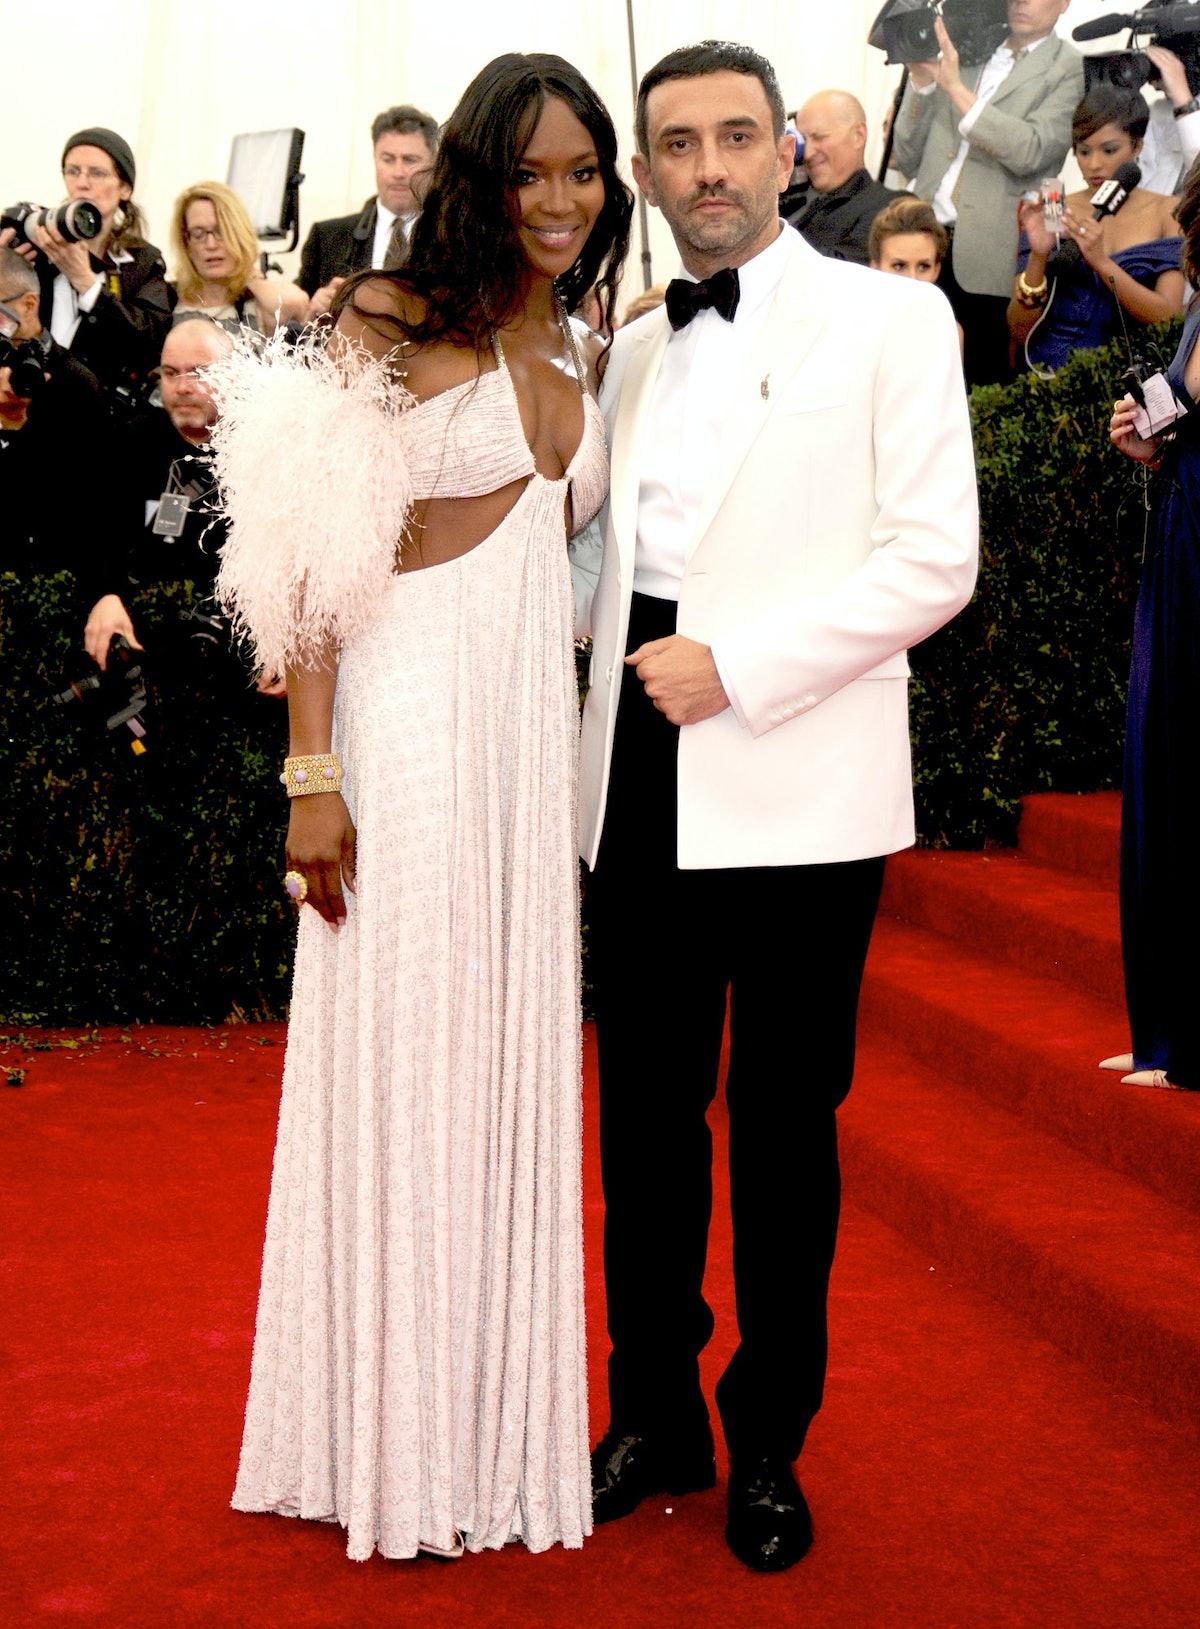 Naomi Campbell and Riccardo Tisci